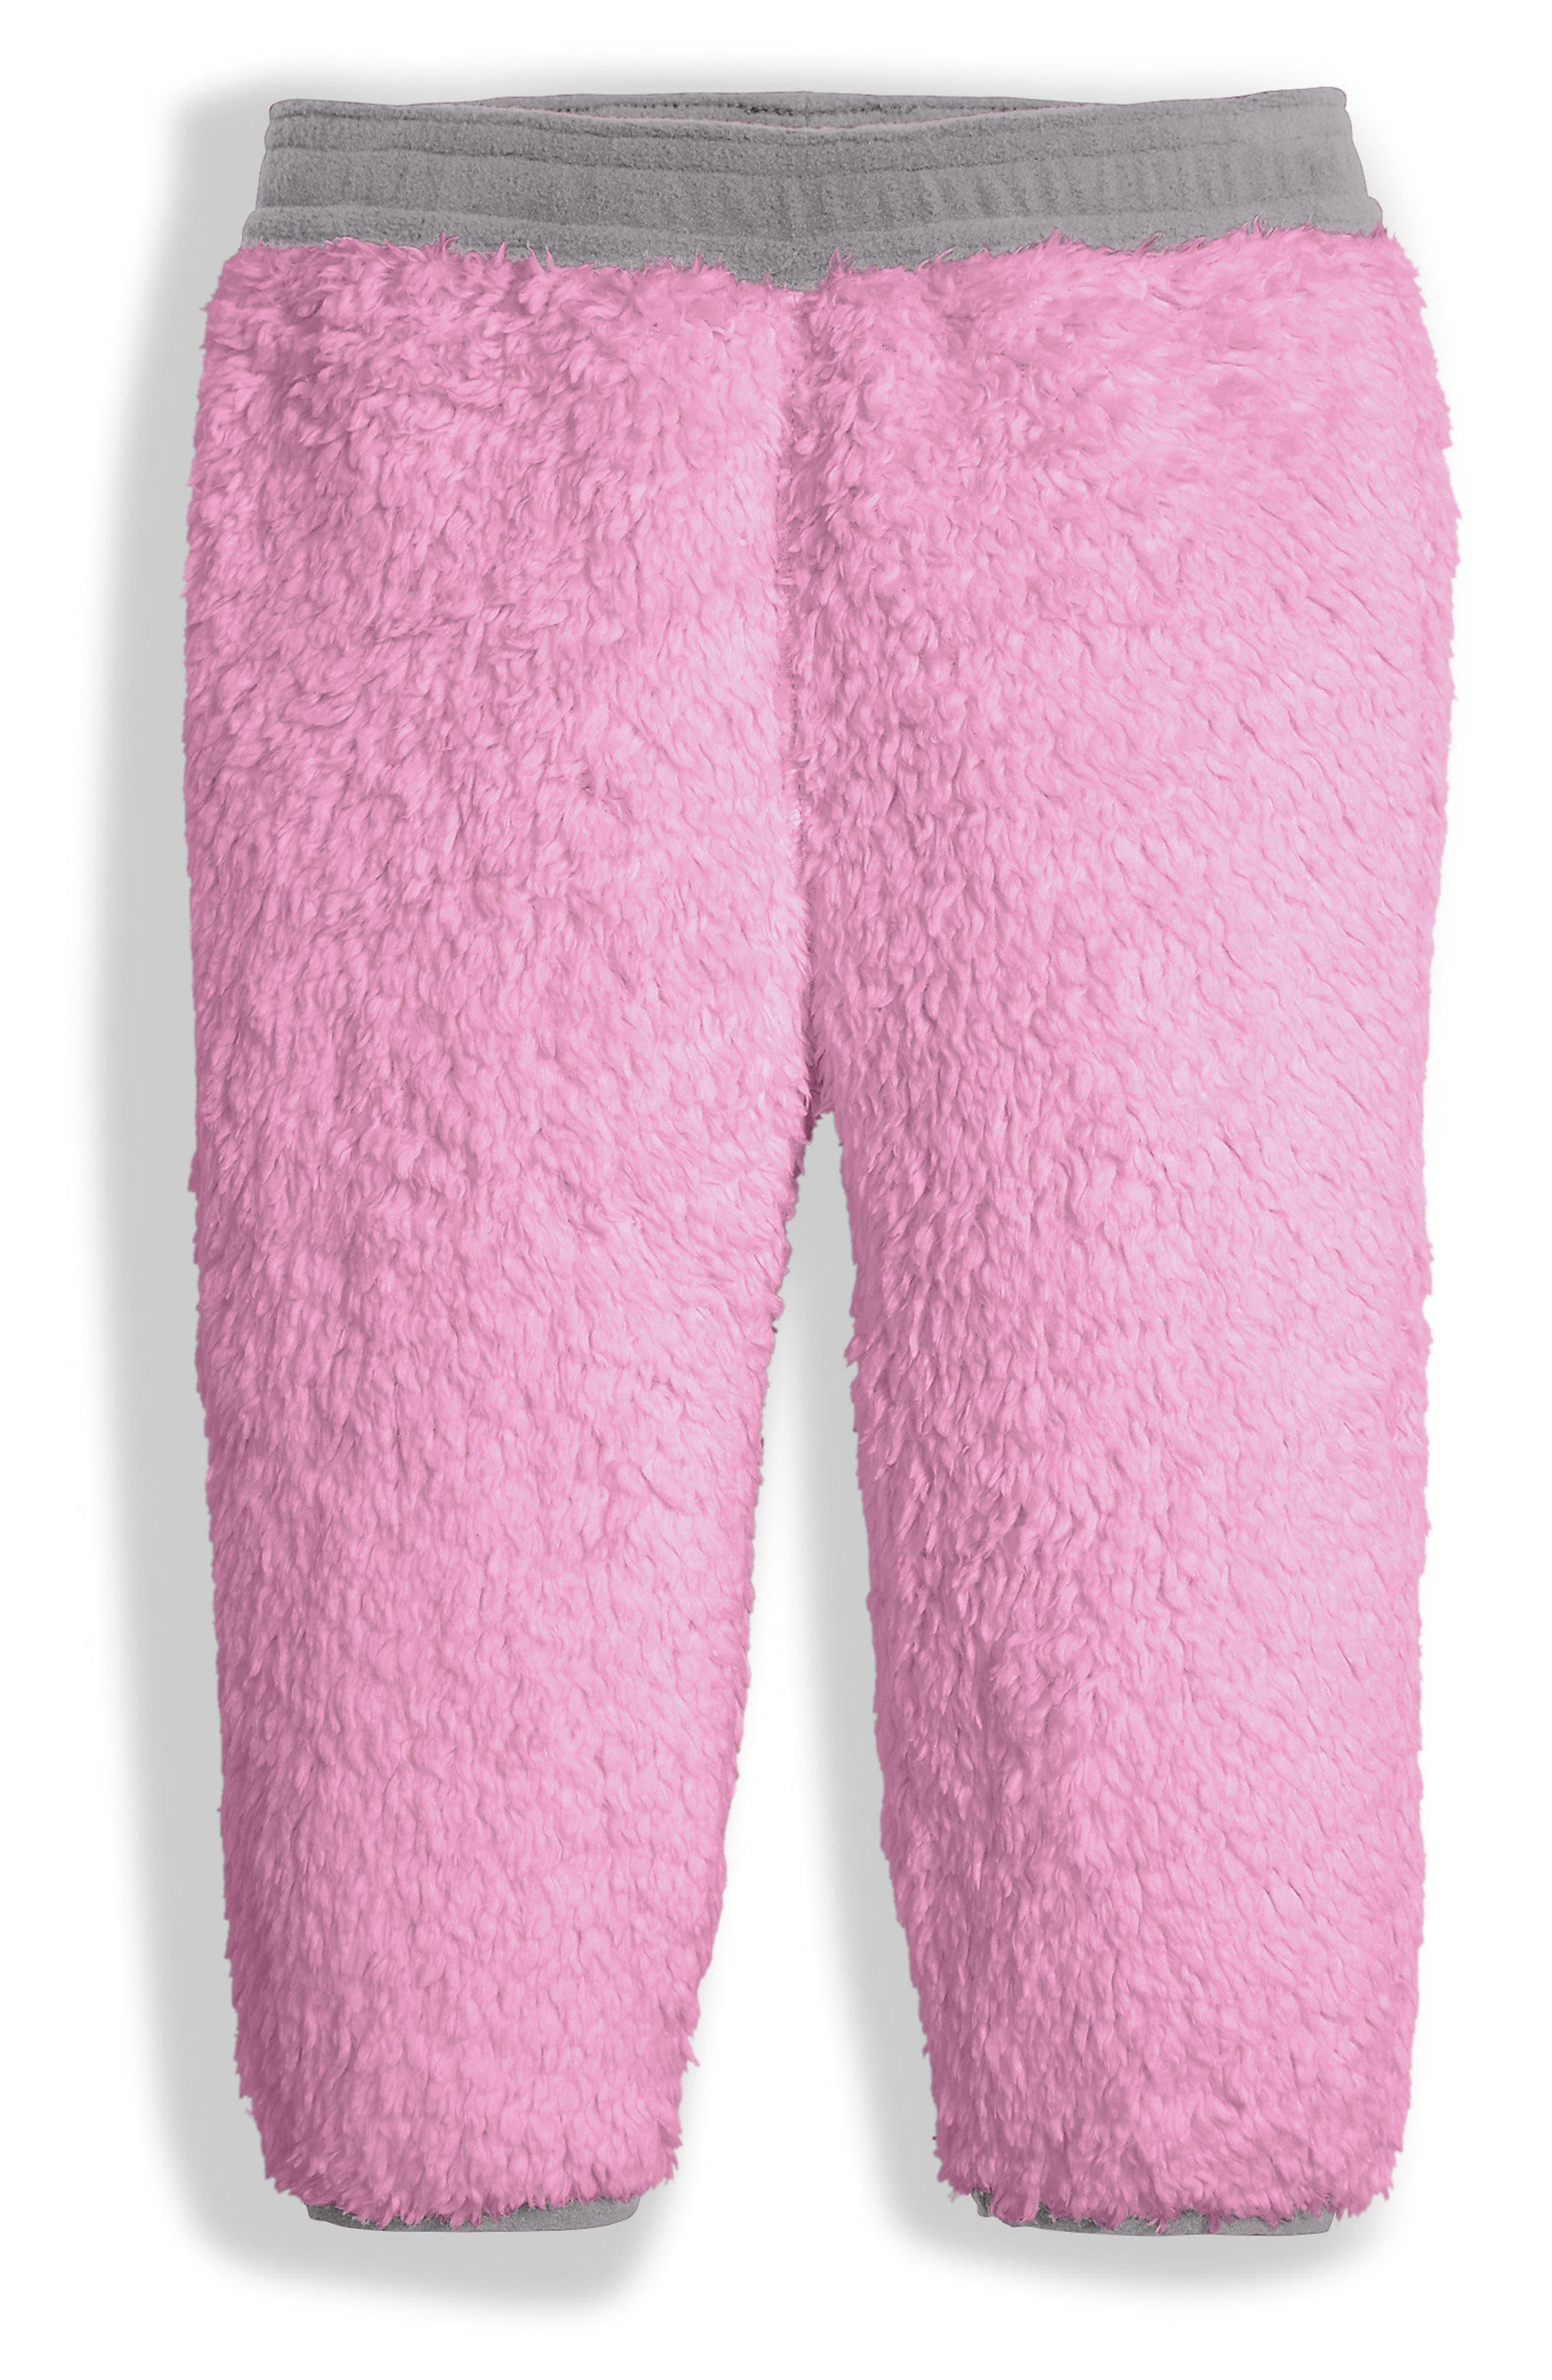 Plushee Pants,                             Main thumbnail 1, color,                             660